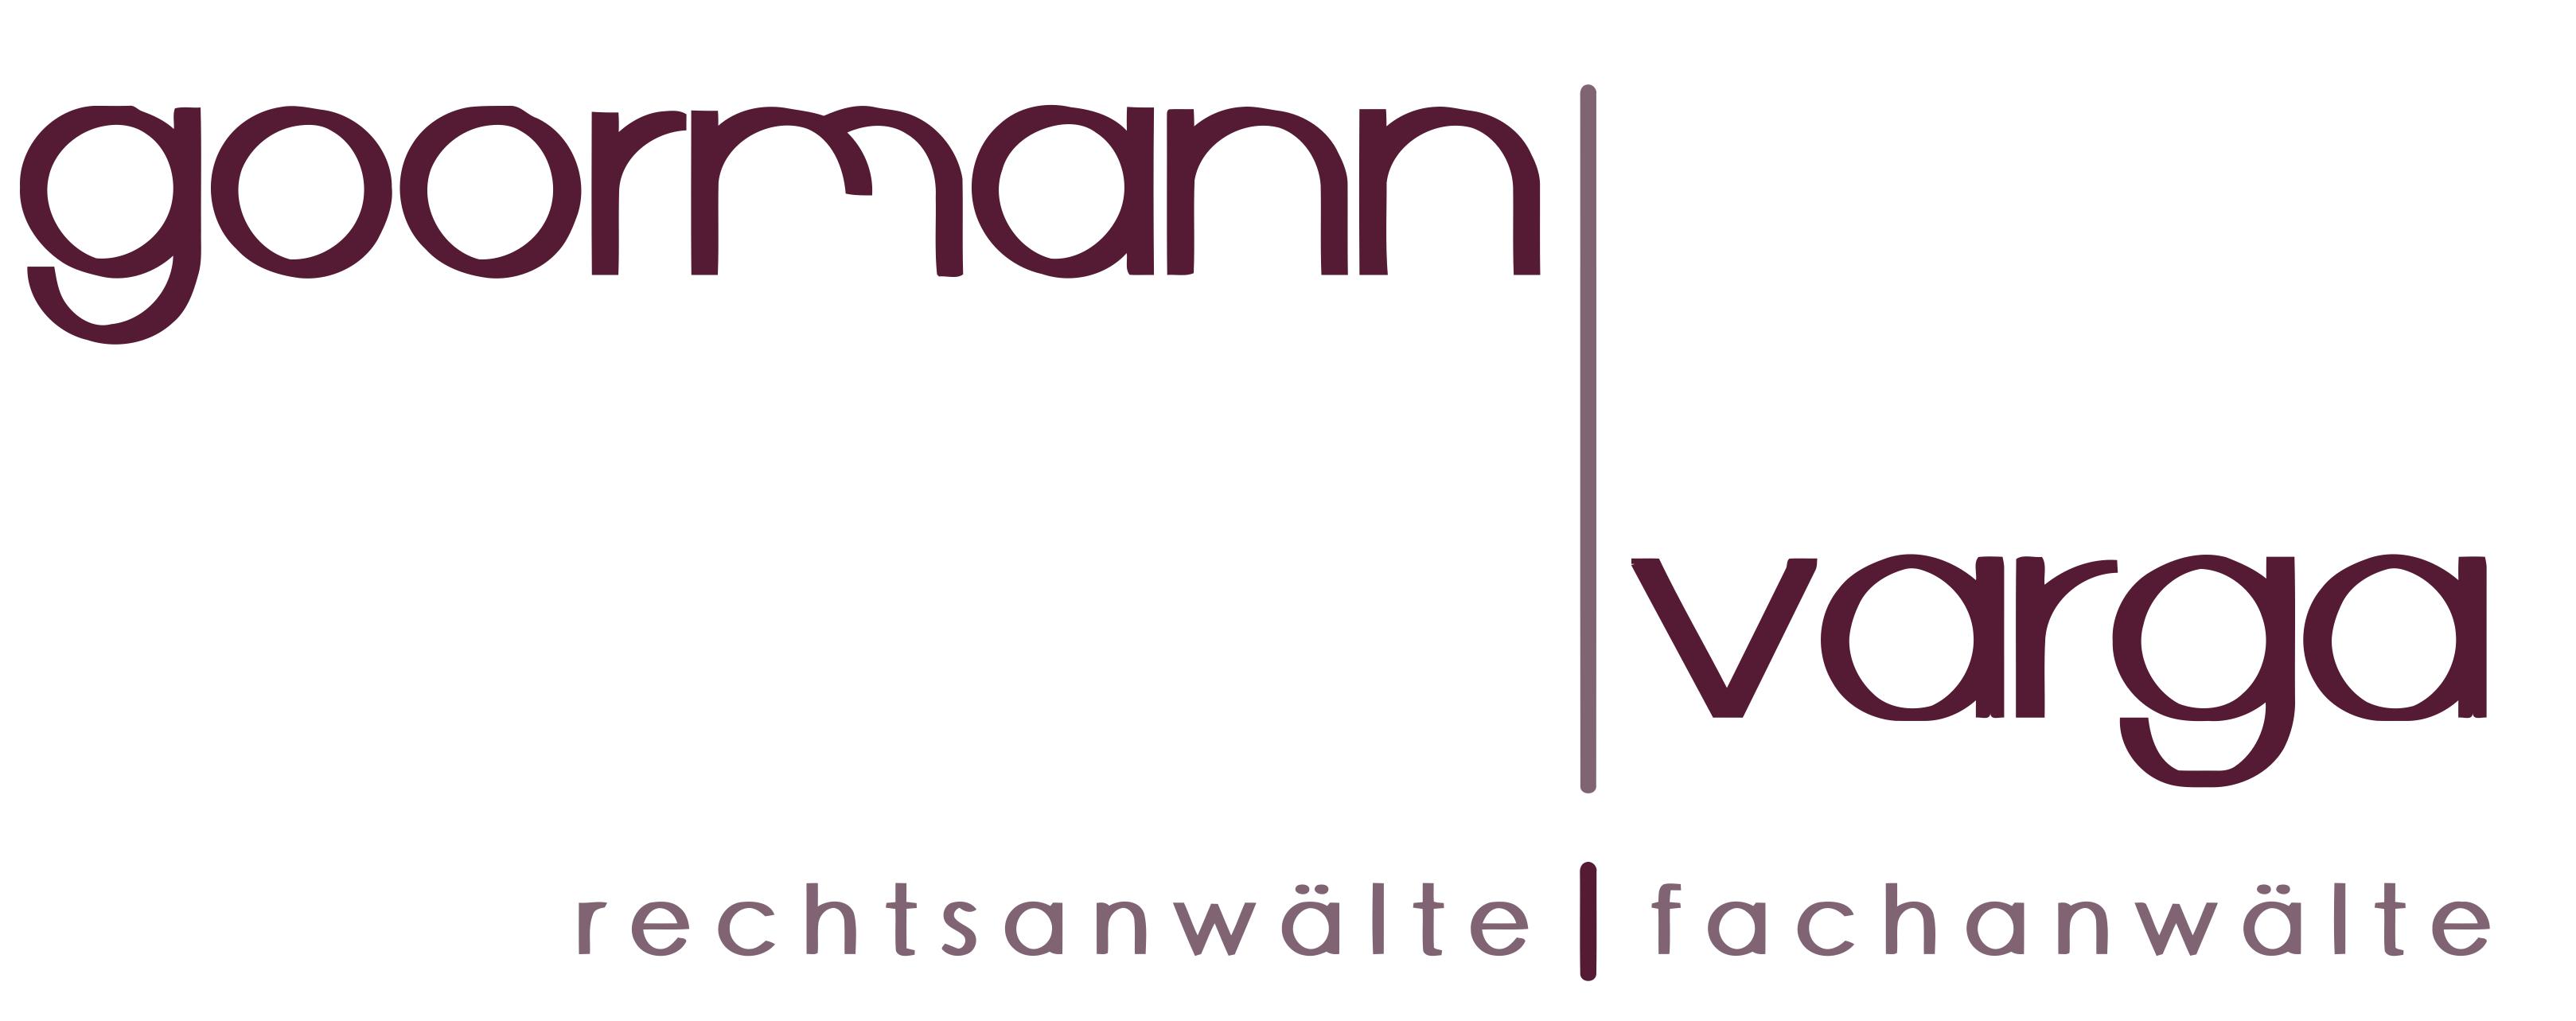 goormann | varga